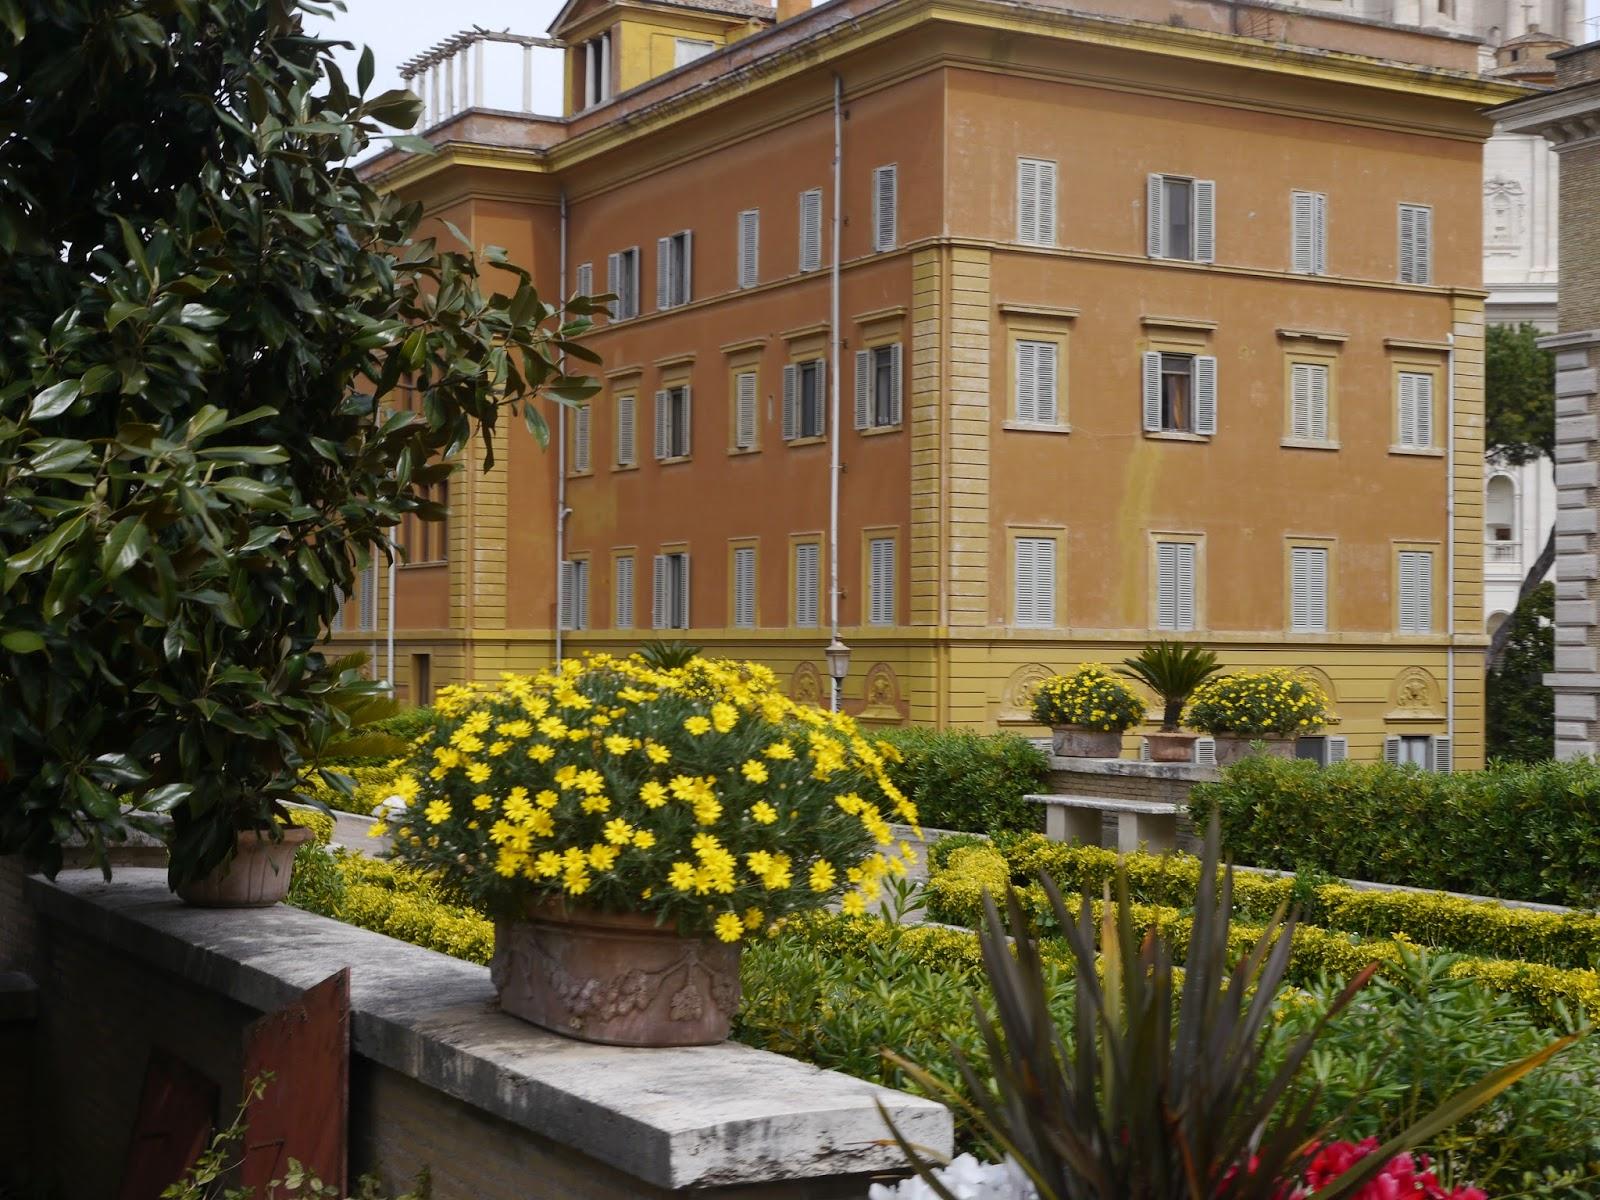 Cucina Divina: Tour of the Vatican Gardens